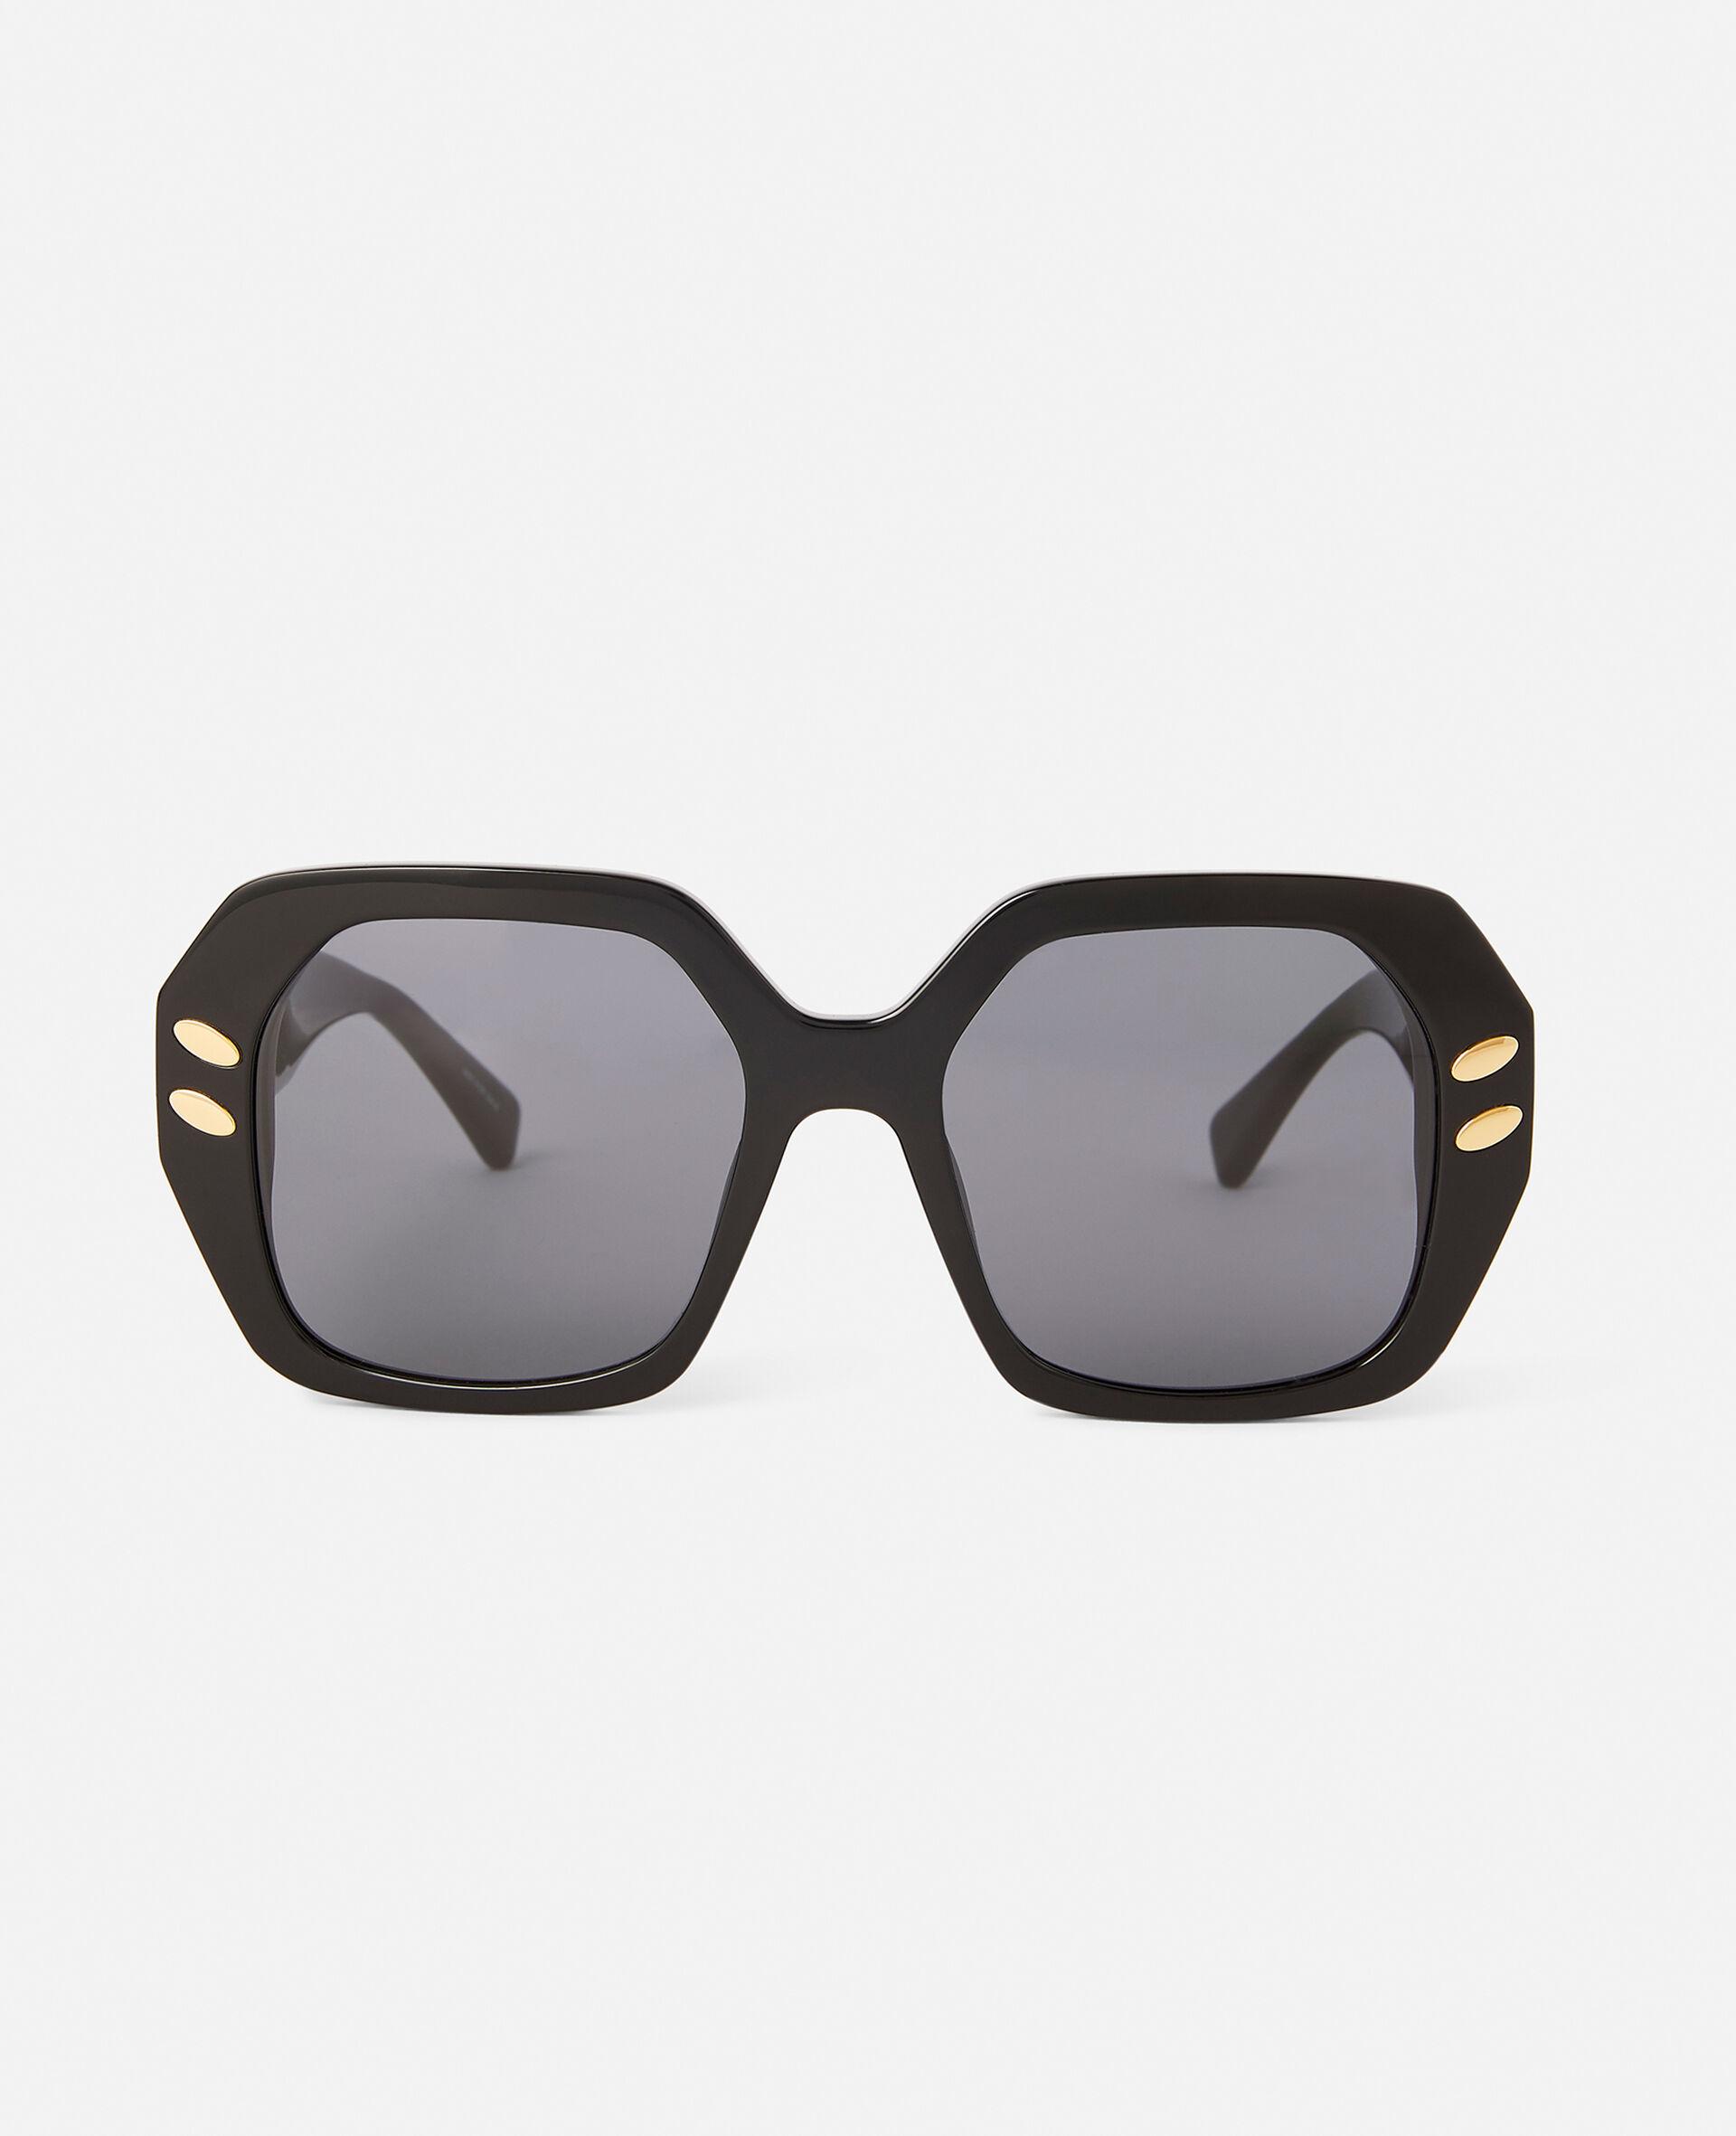 Brown Geometric Sunglasses-Brown-large image number 0